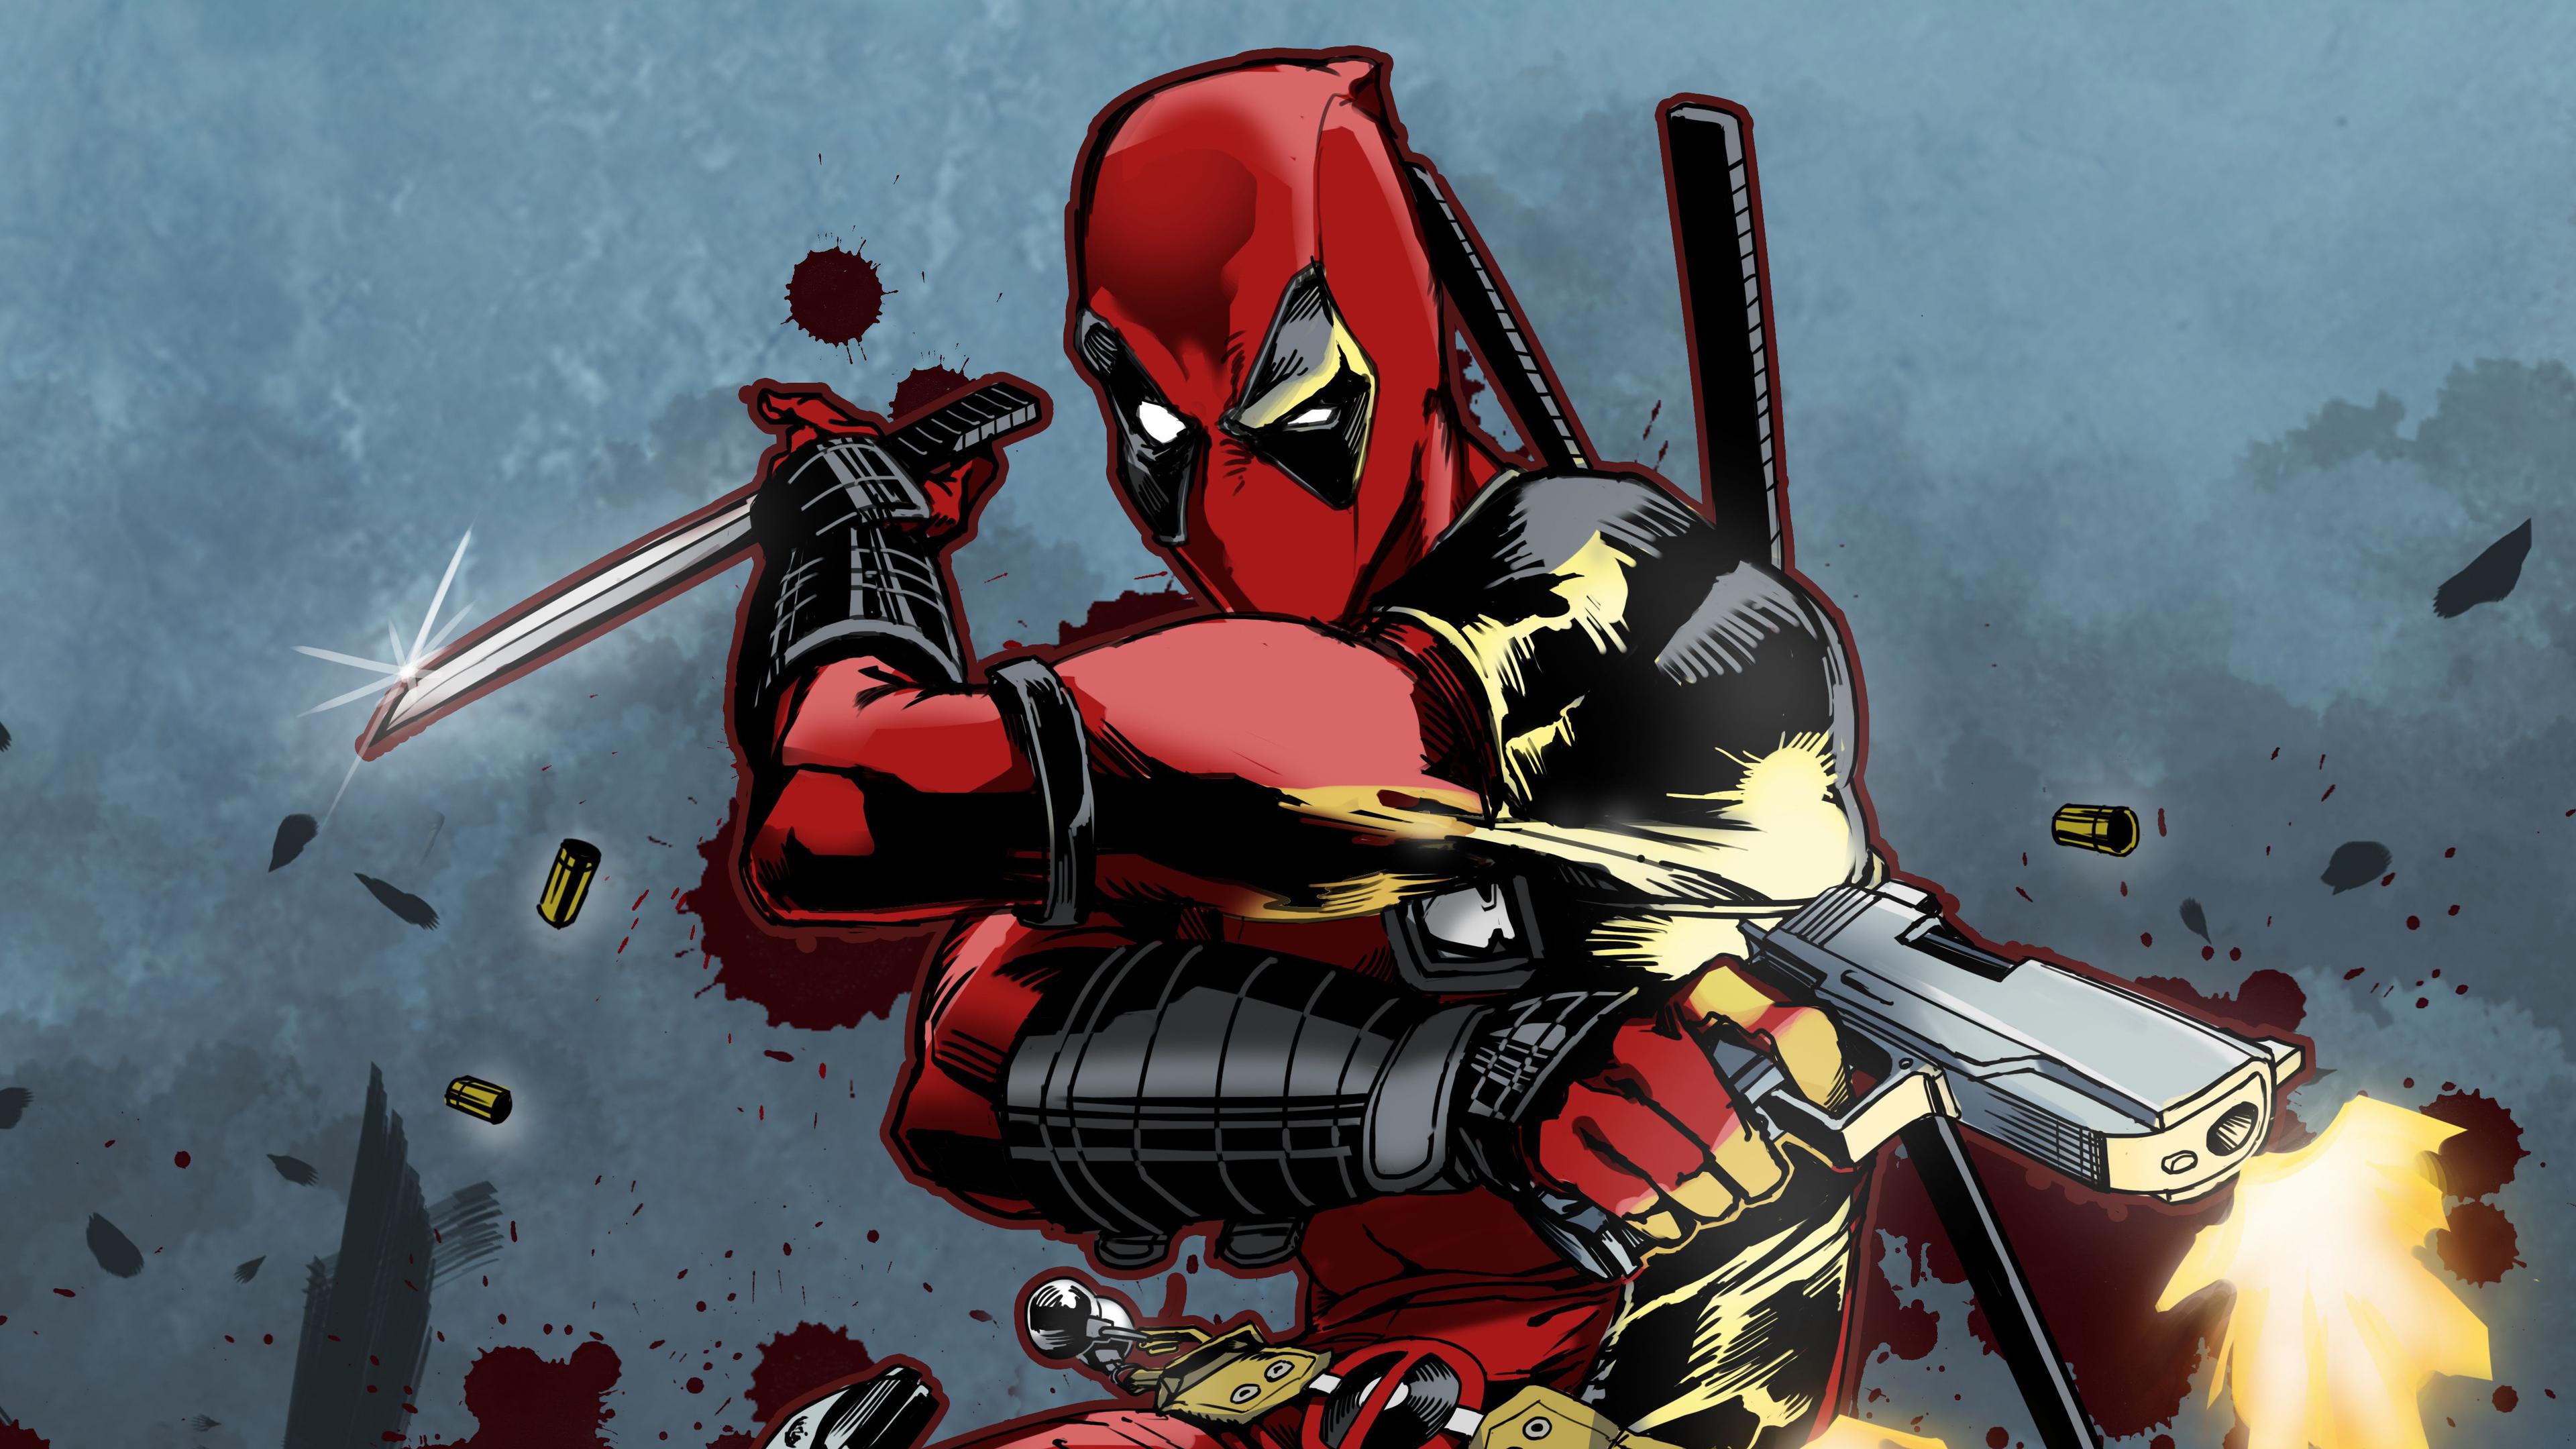 2048x2048 Deadpool 2 Movie Poster 4k Ipad Air Hd 4k: Deadpool New Art 4k Superheroes Wallpapers, Hd-wallpapers